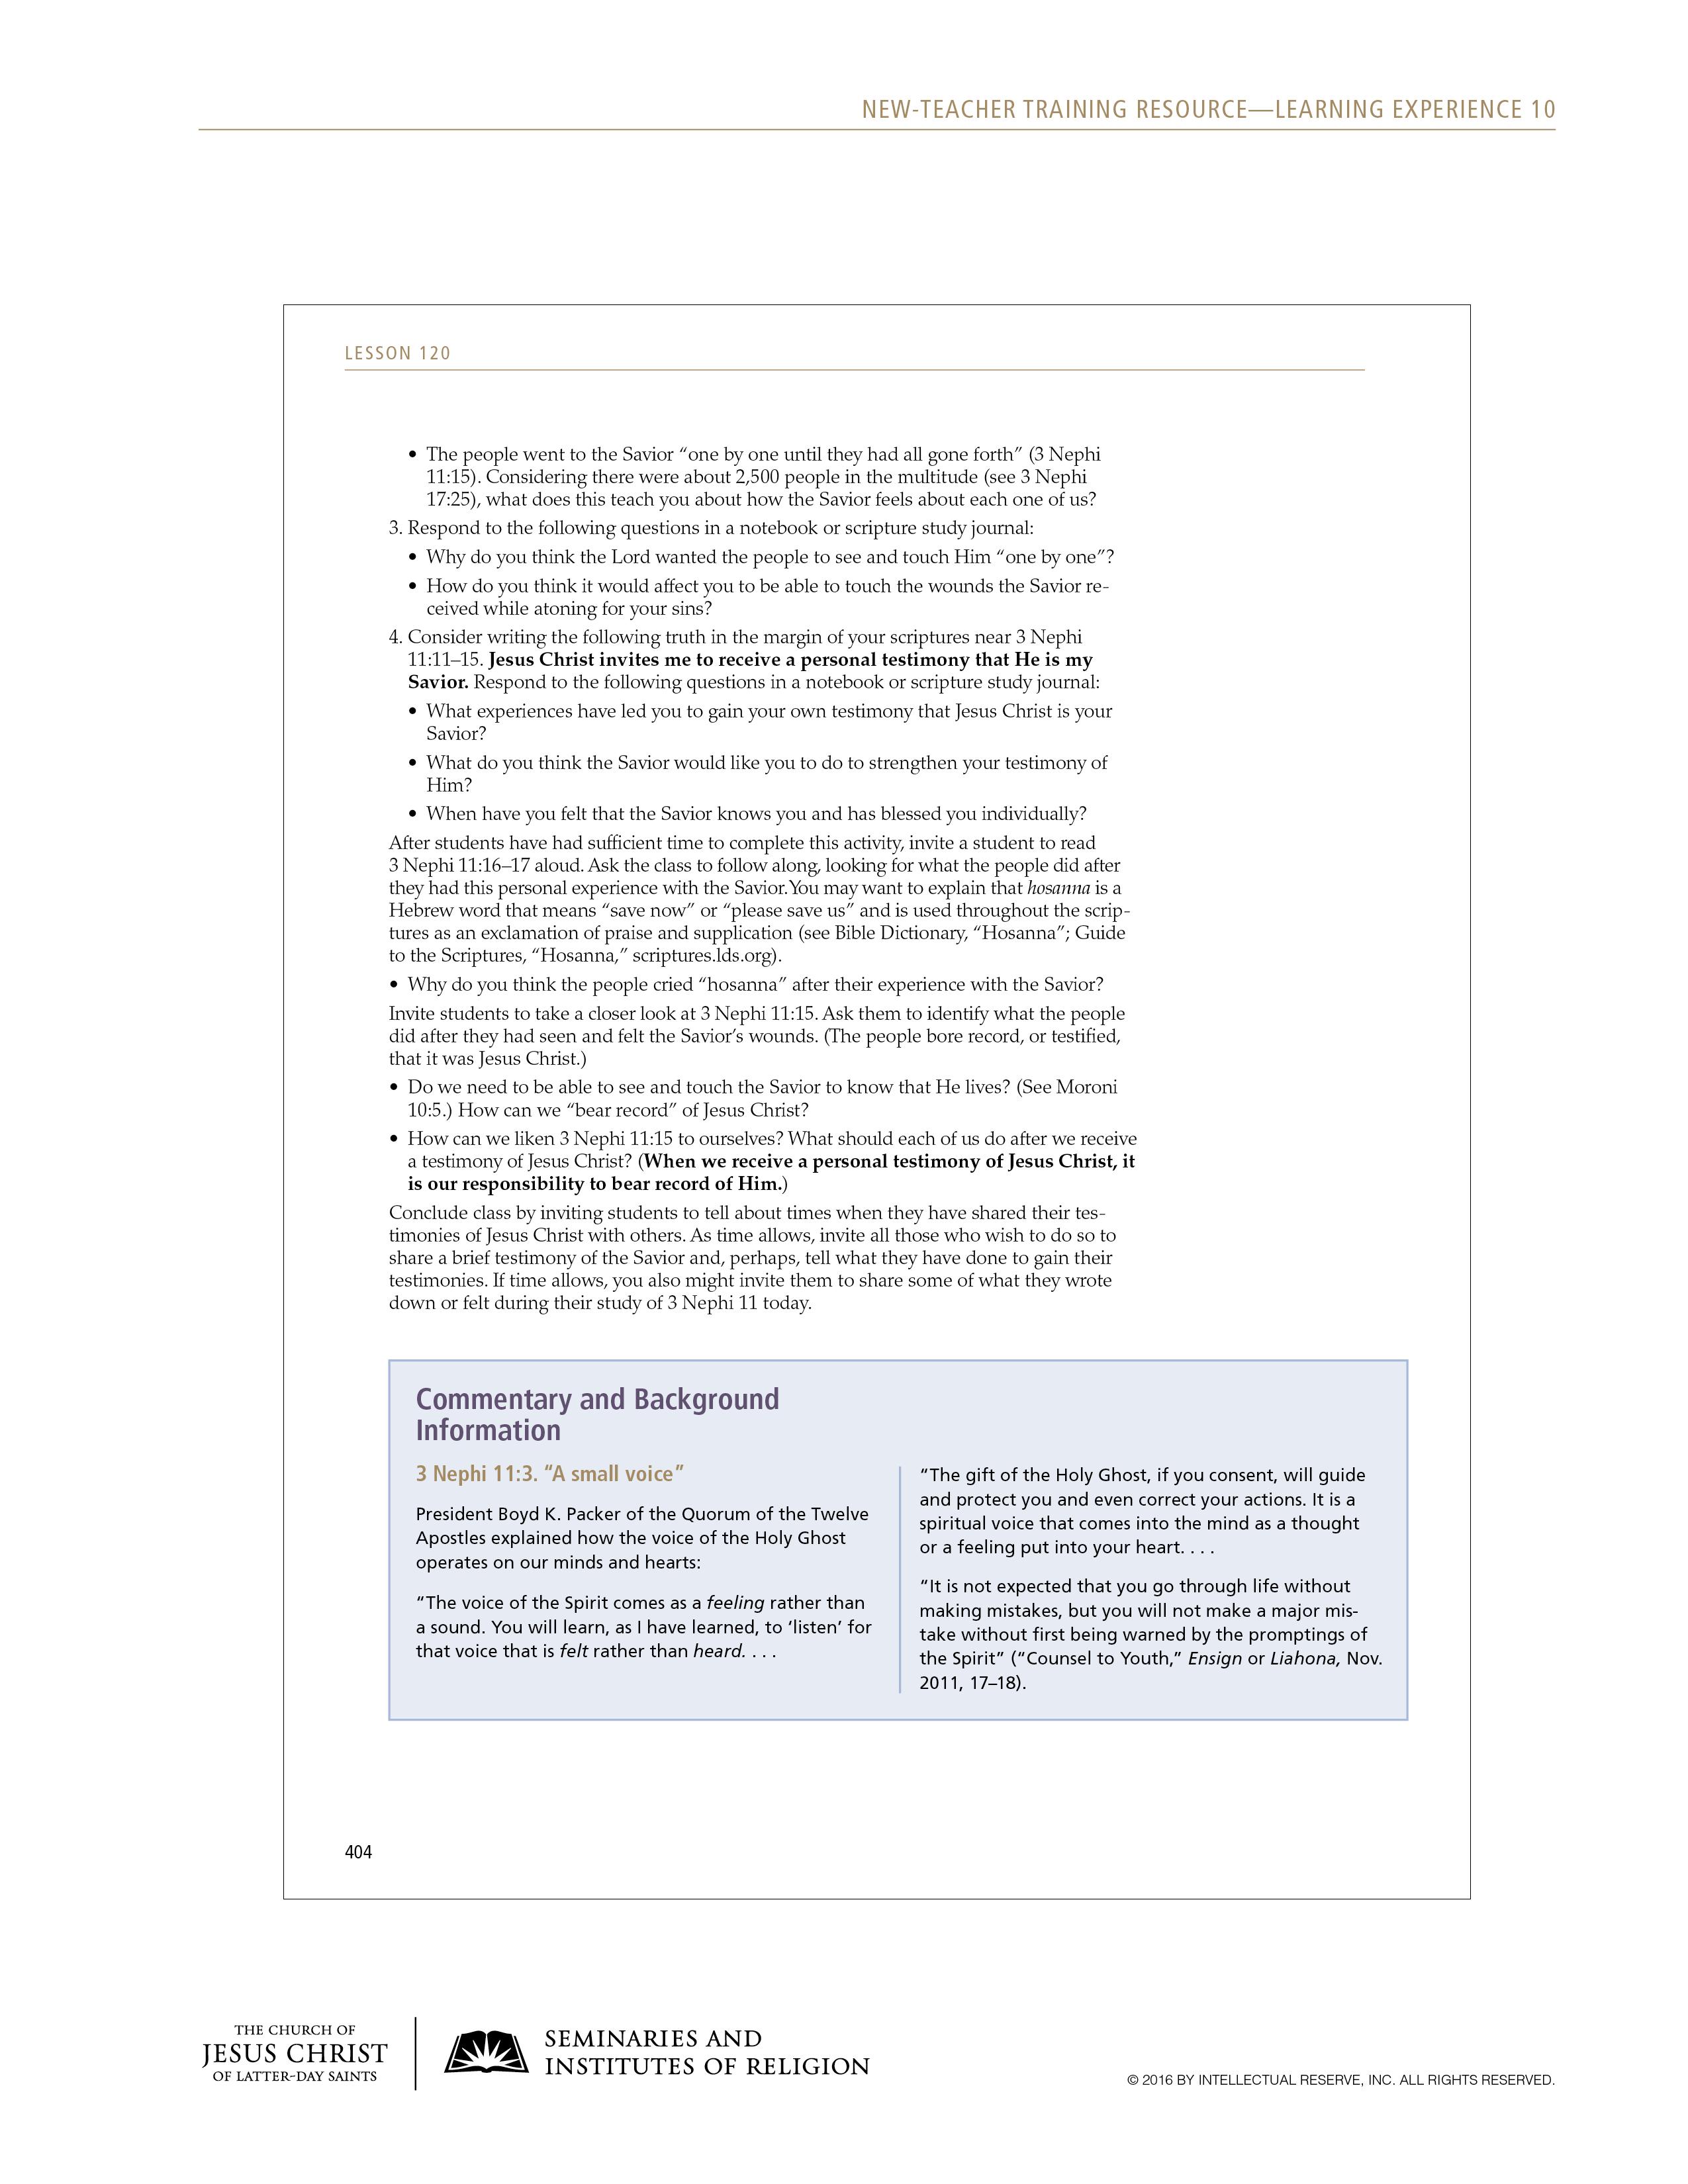 handout, Sample Lesson, page 3